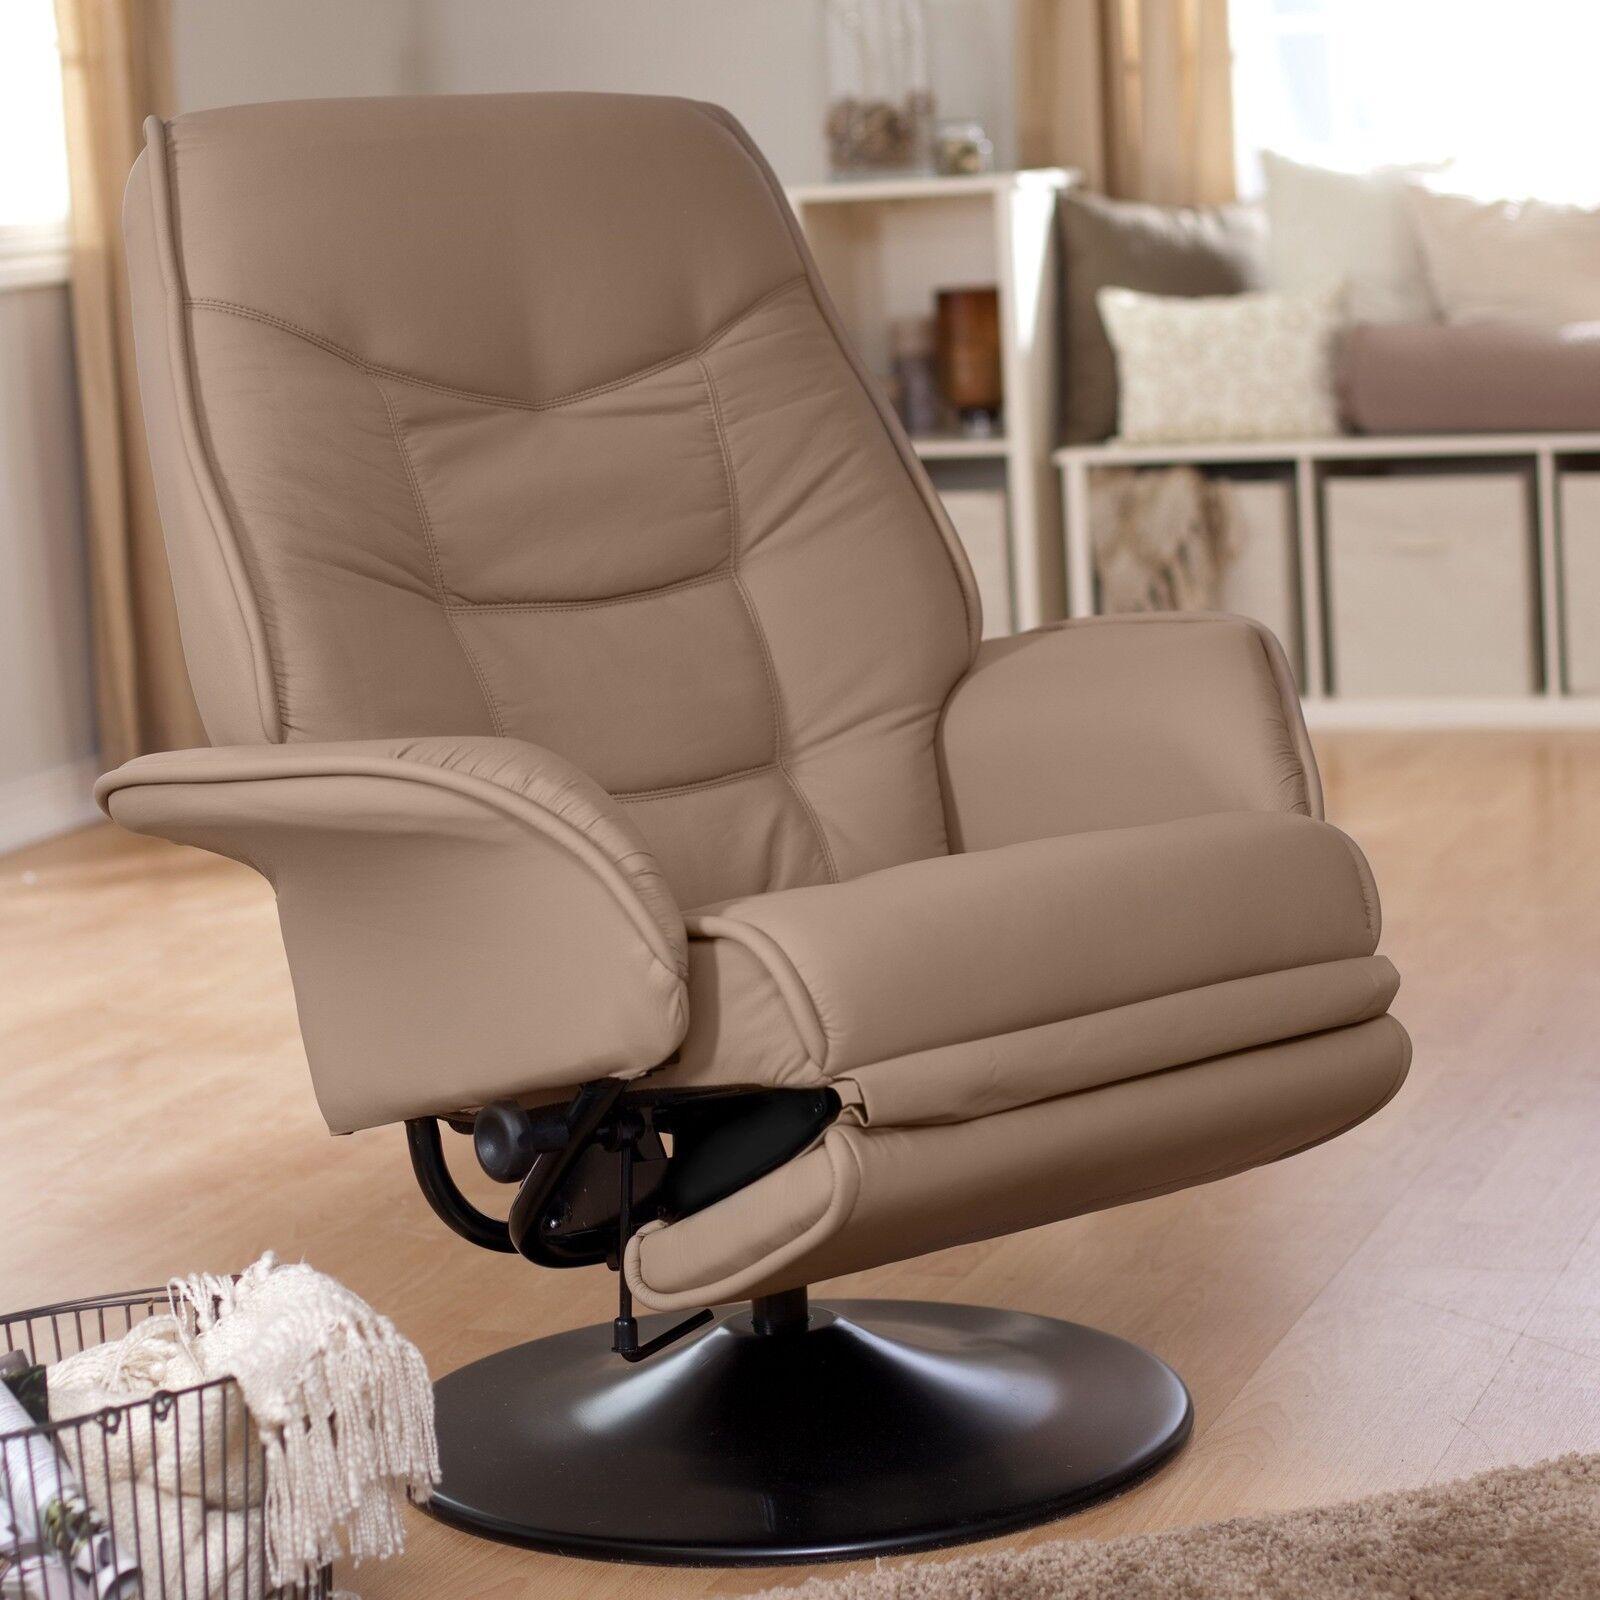 Coaster Furniture Leatherette Swivel Recliner Chair in Bone Finish